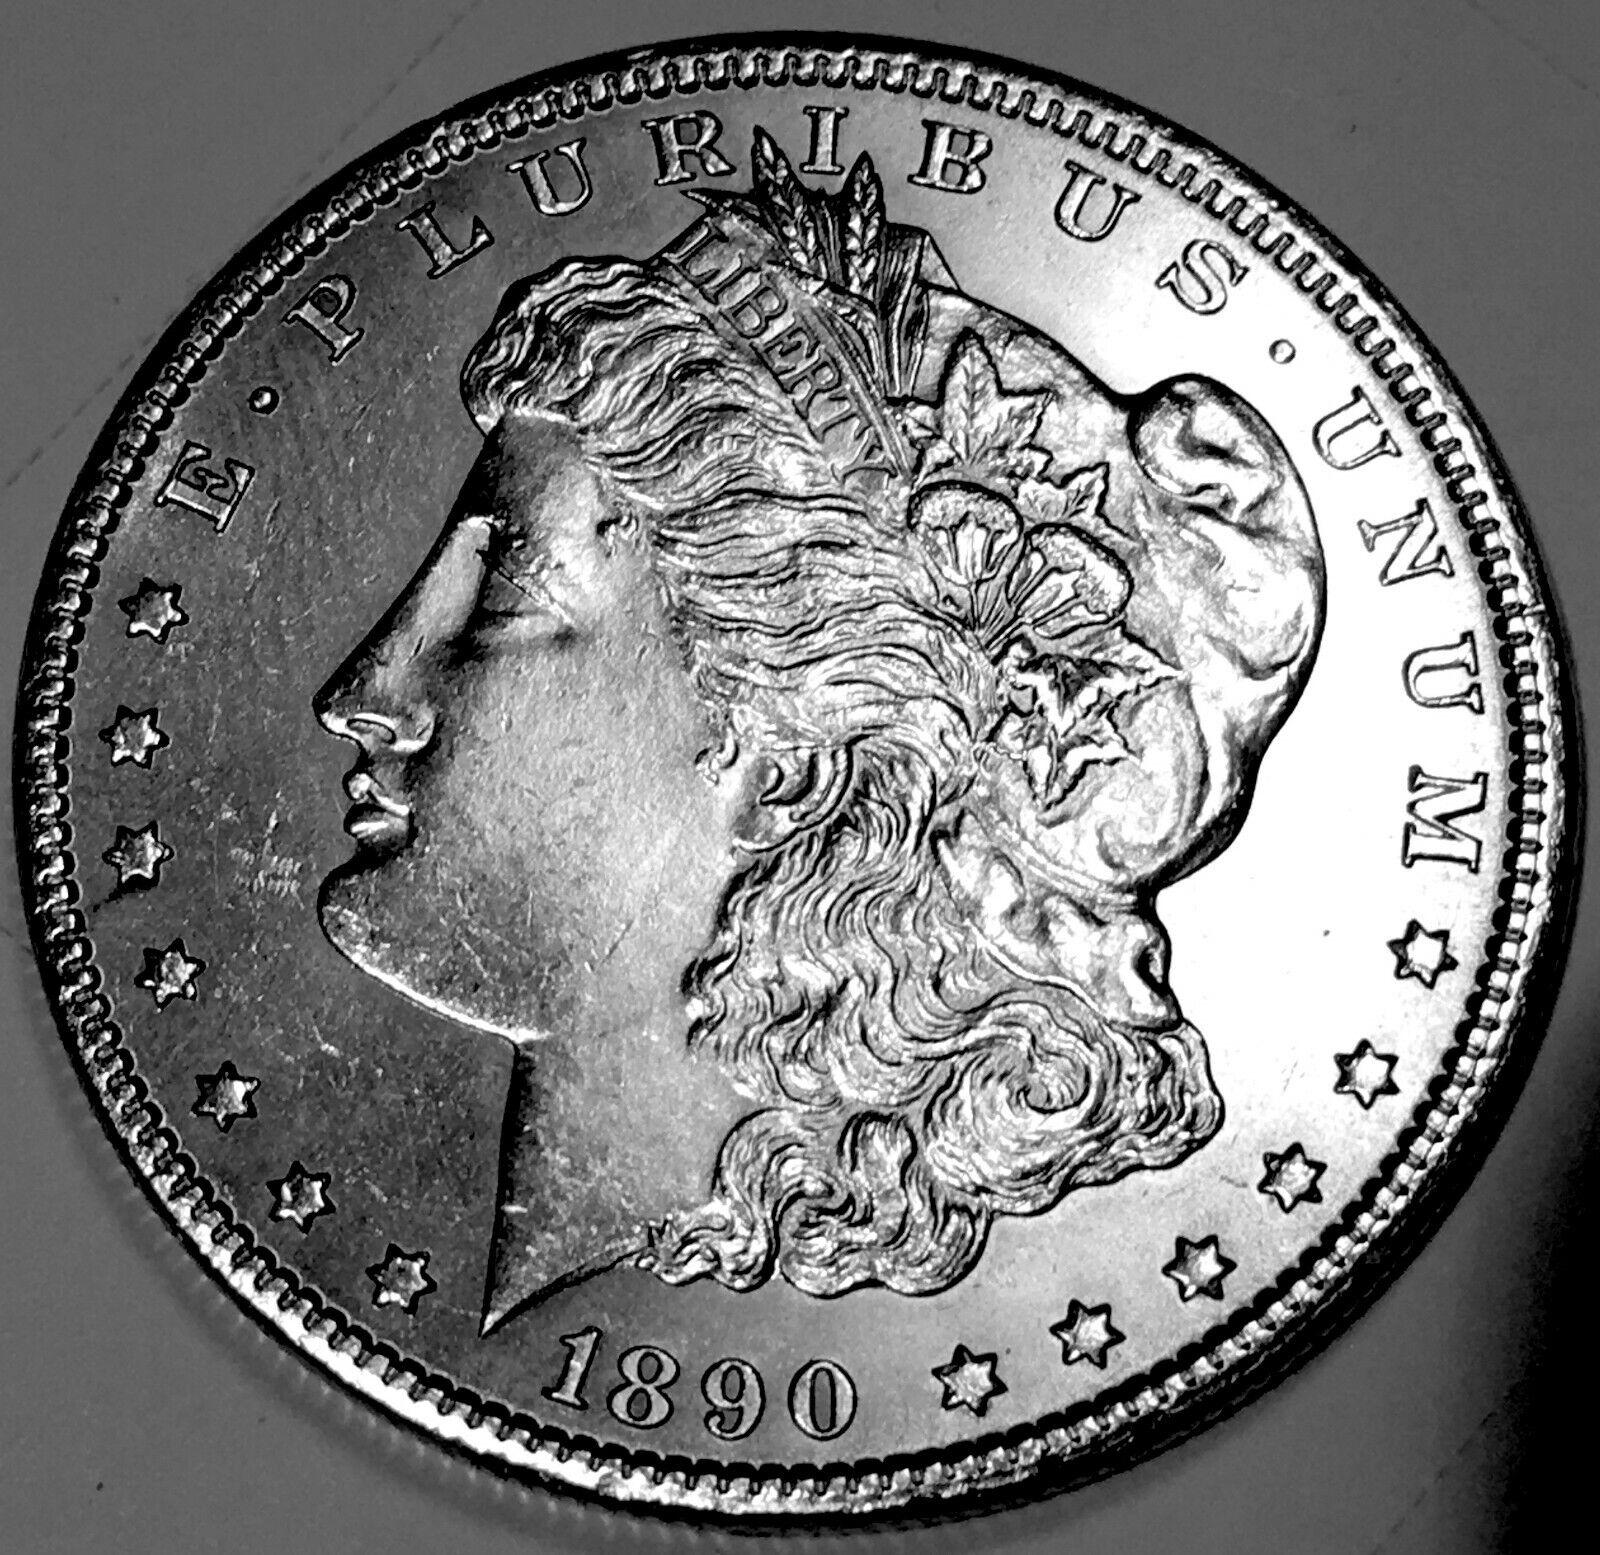 1890 CC Morgan Dollar GEM BU 1 - $825.00